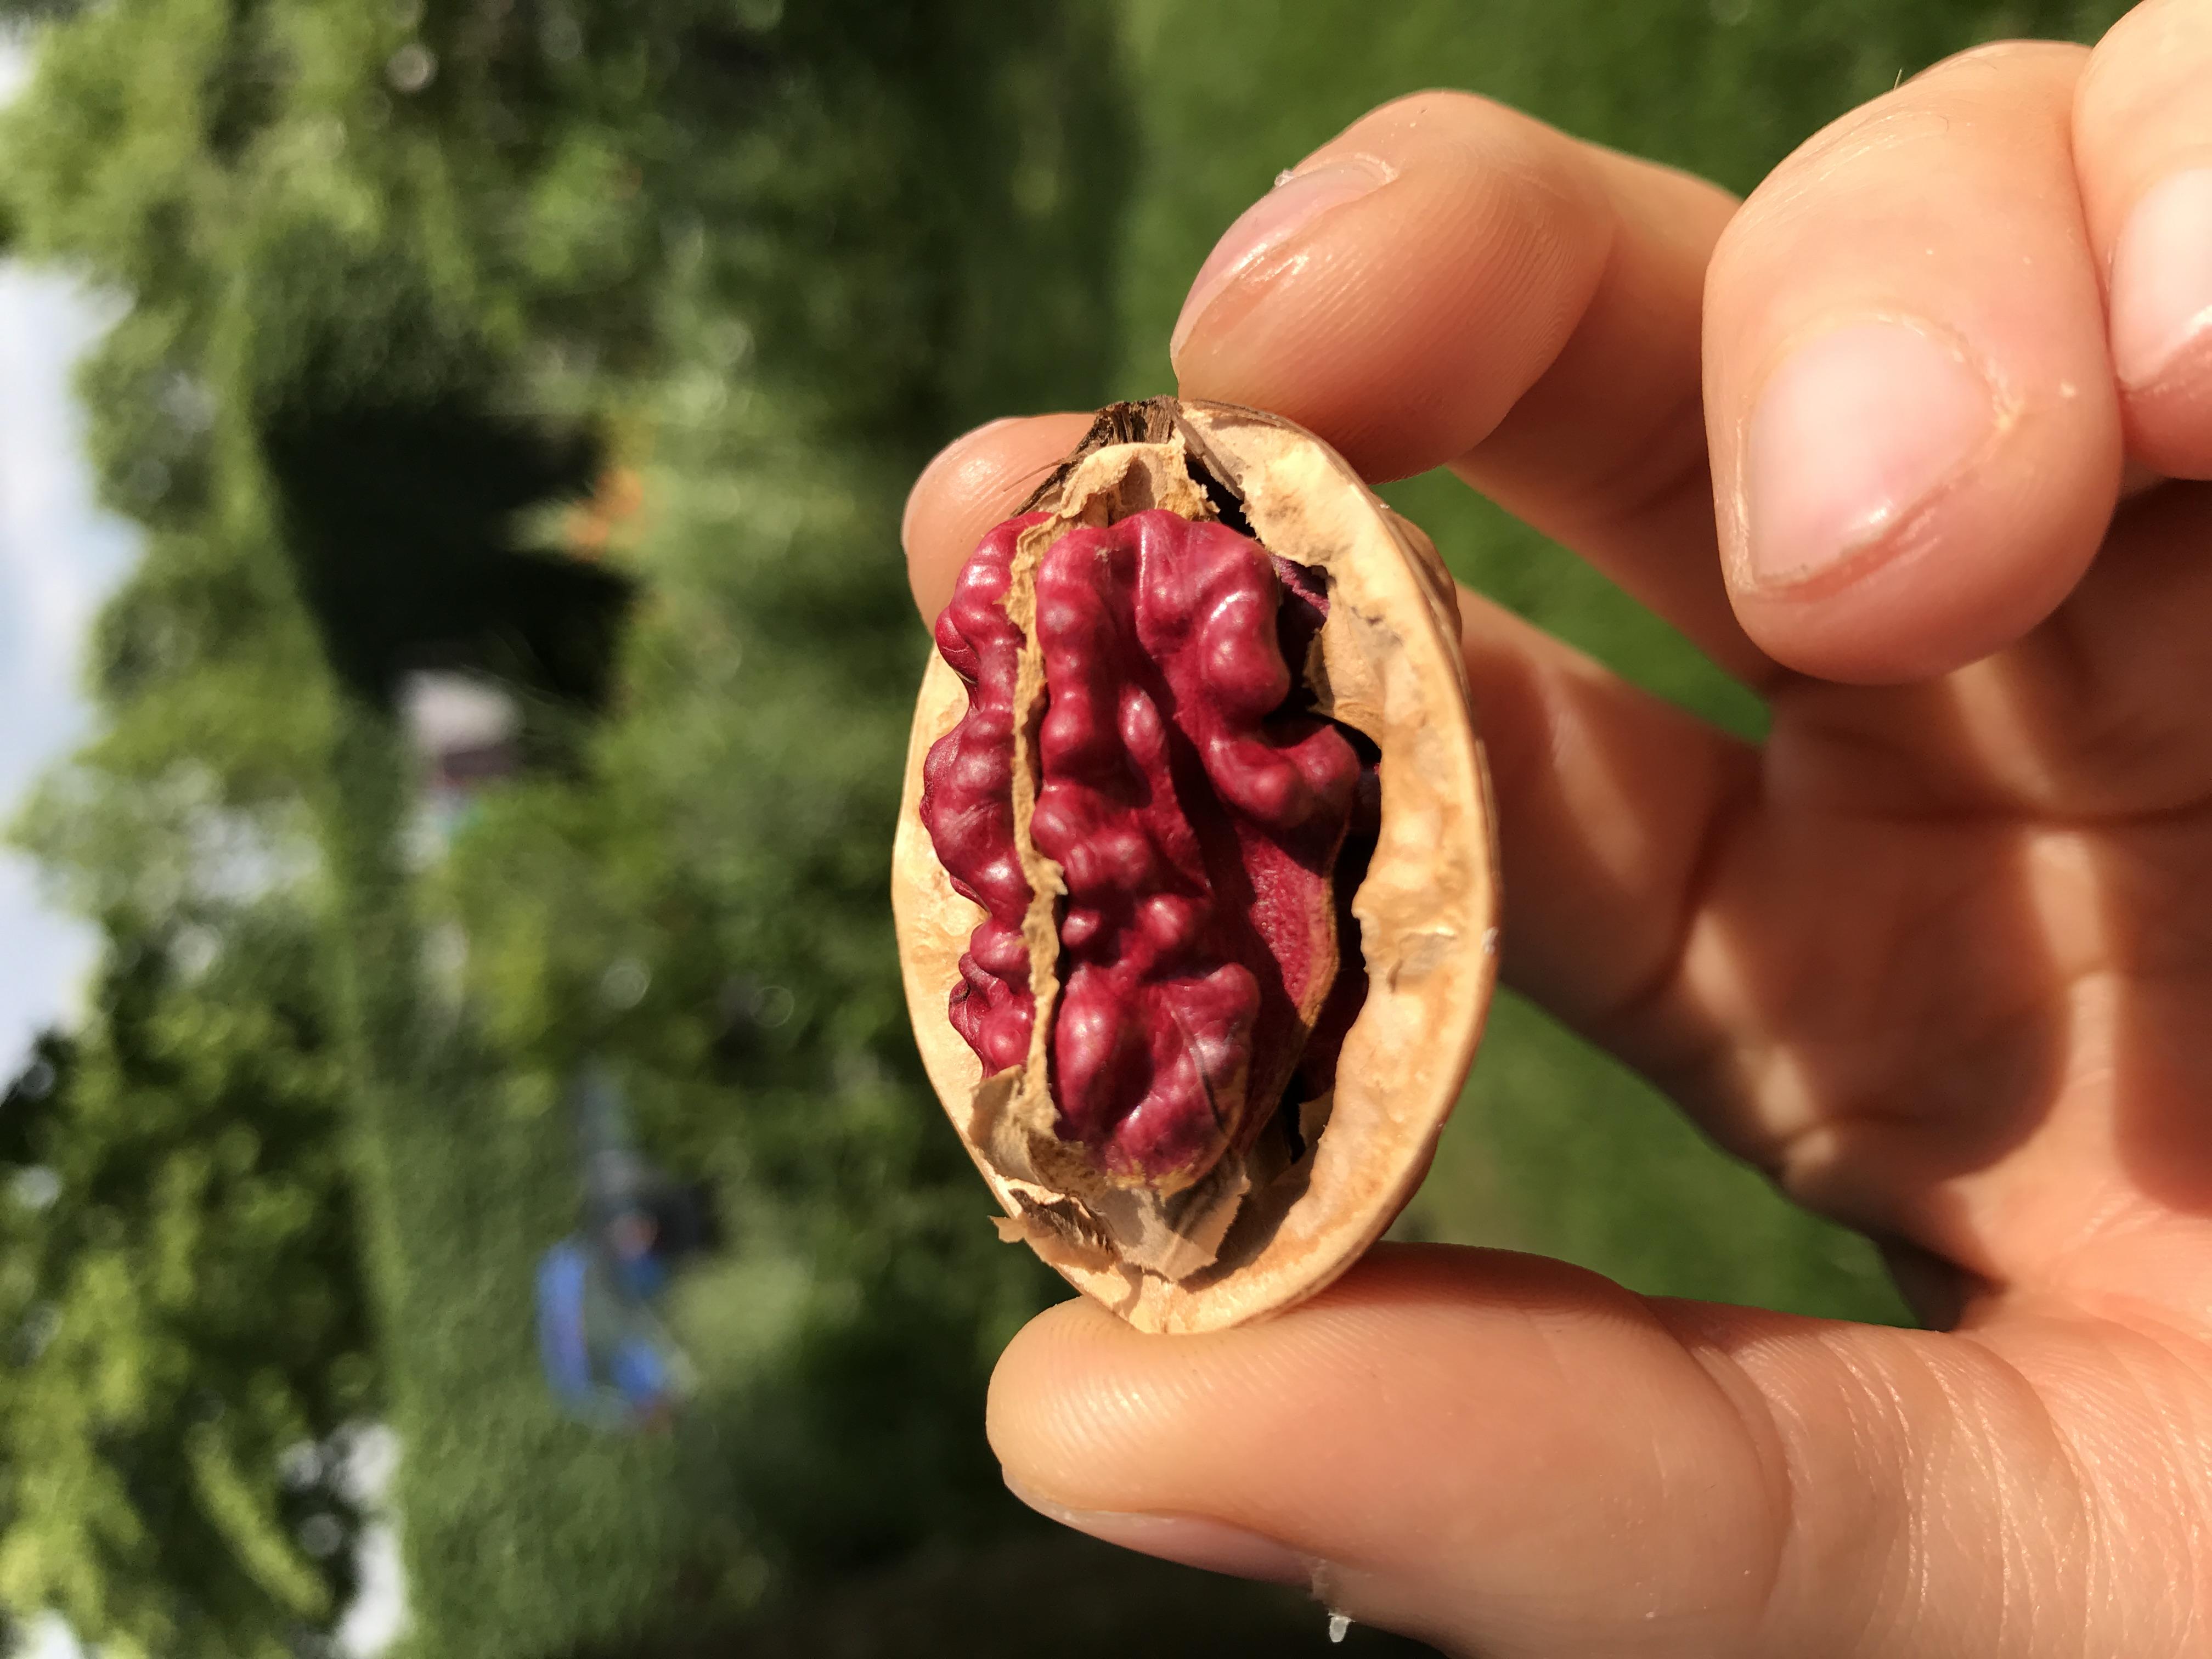 Walnussbaum Rote Donaunuss